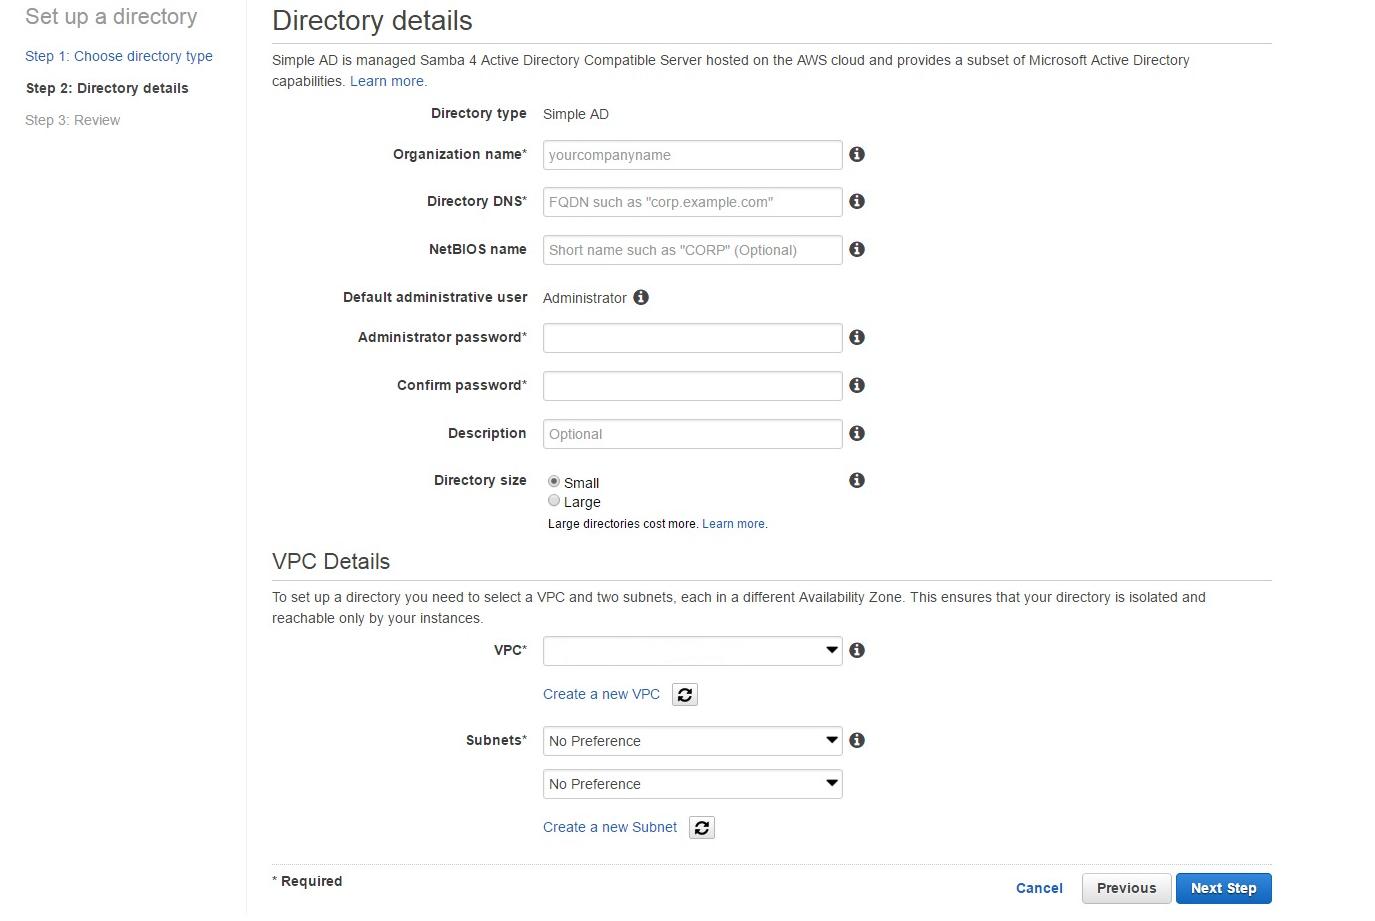 directoryDetails